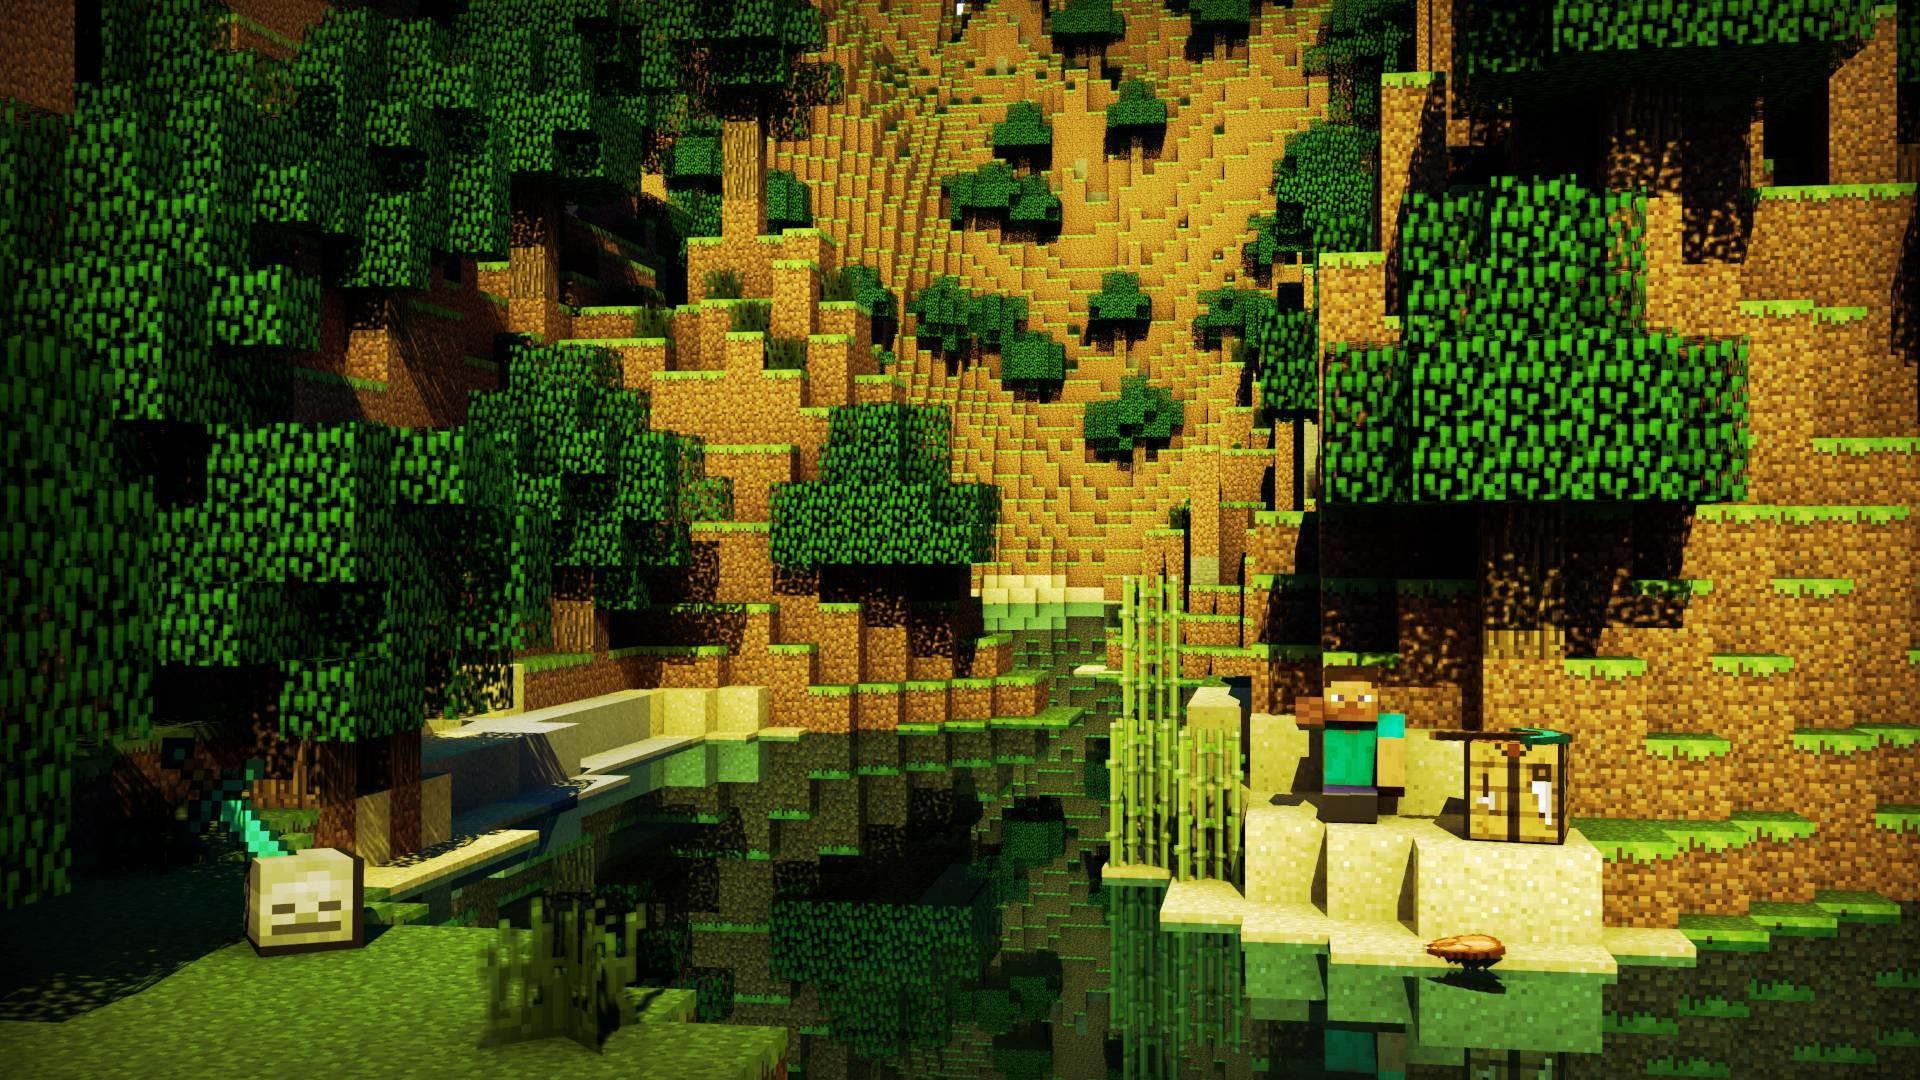 Fantastic Wallpaper Minecraft Ios - 1073655-desktop-wallpaper-minecraft-1920x1080-for-ios  Graphic_42754.jpg